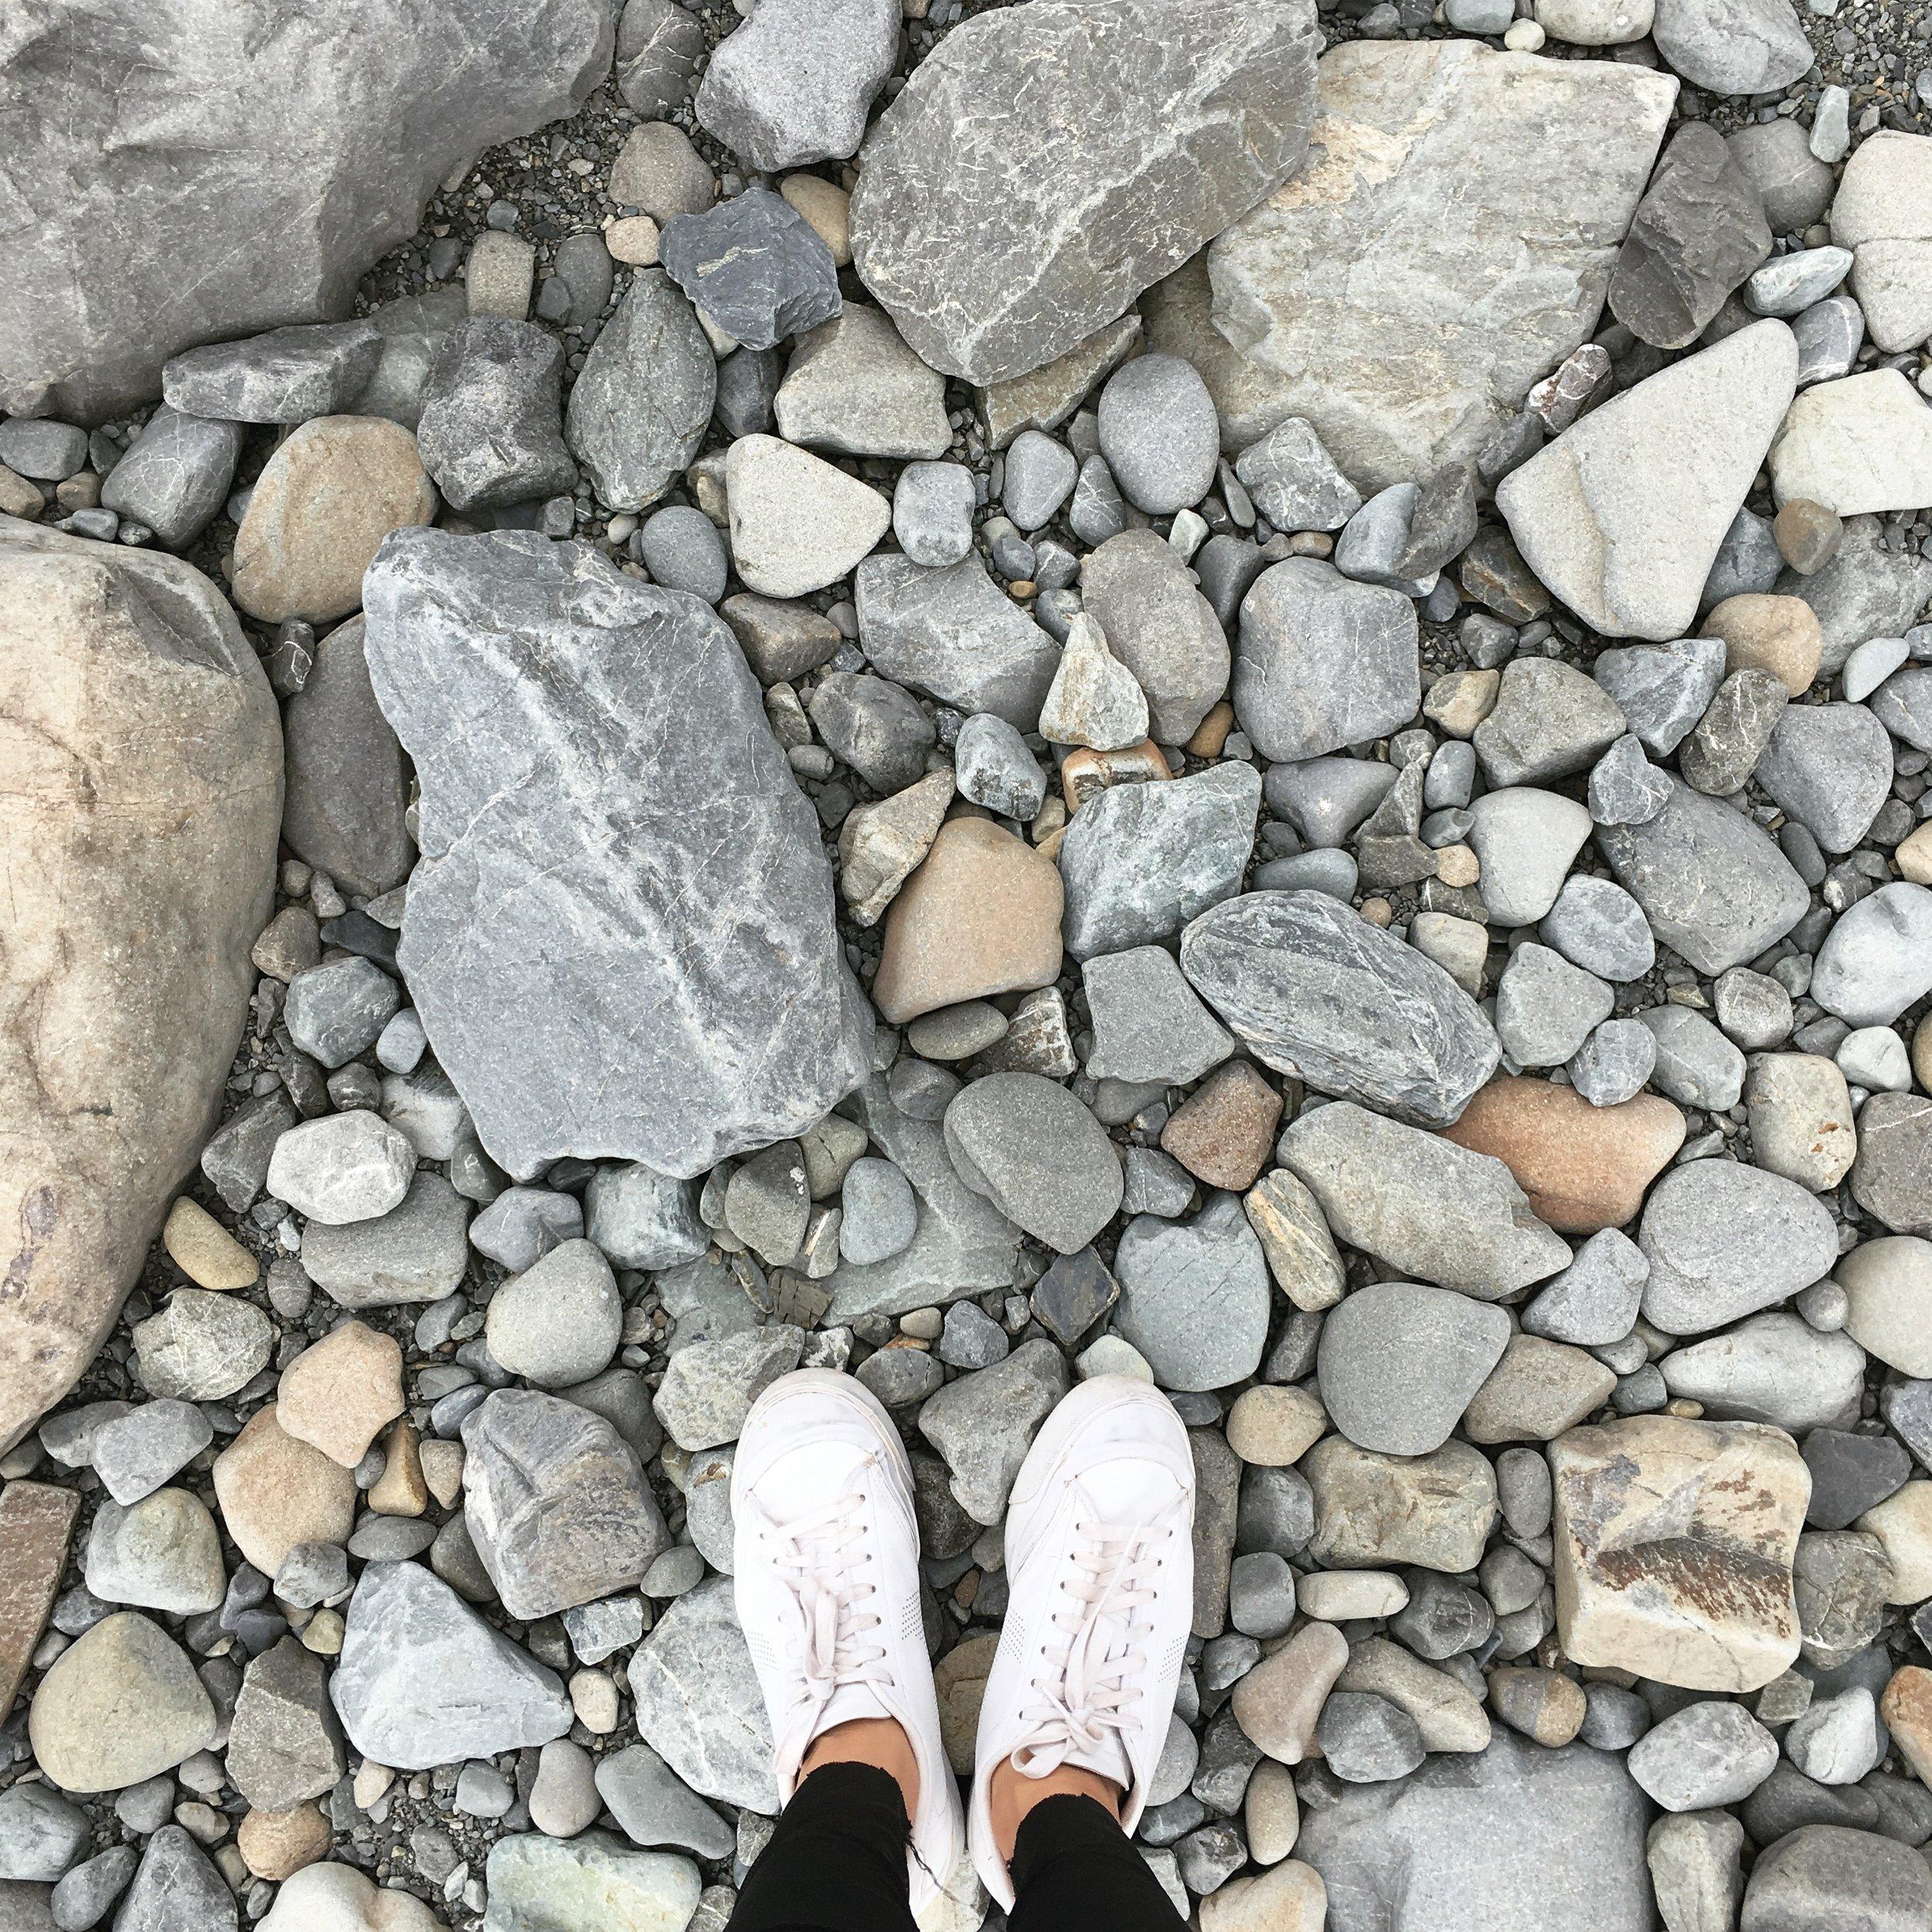 Lozidaze_NZ_Lake-Pukaki_Stones_01